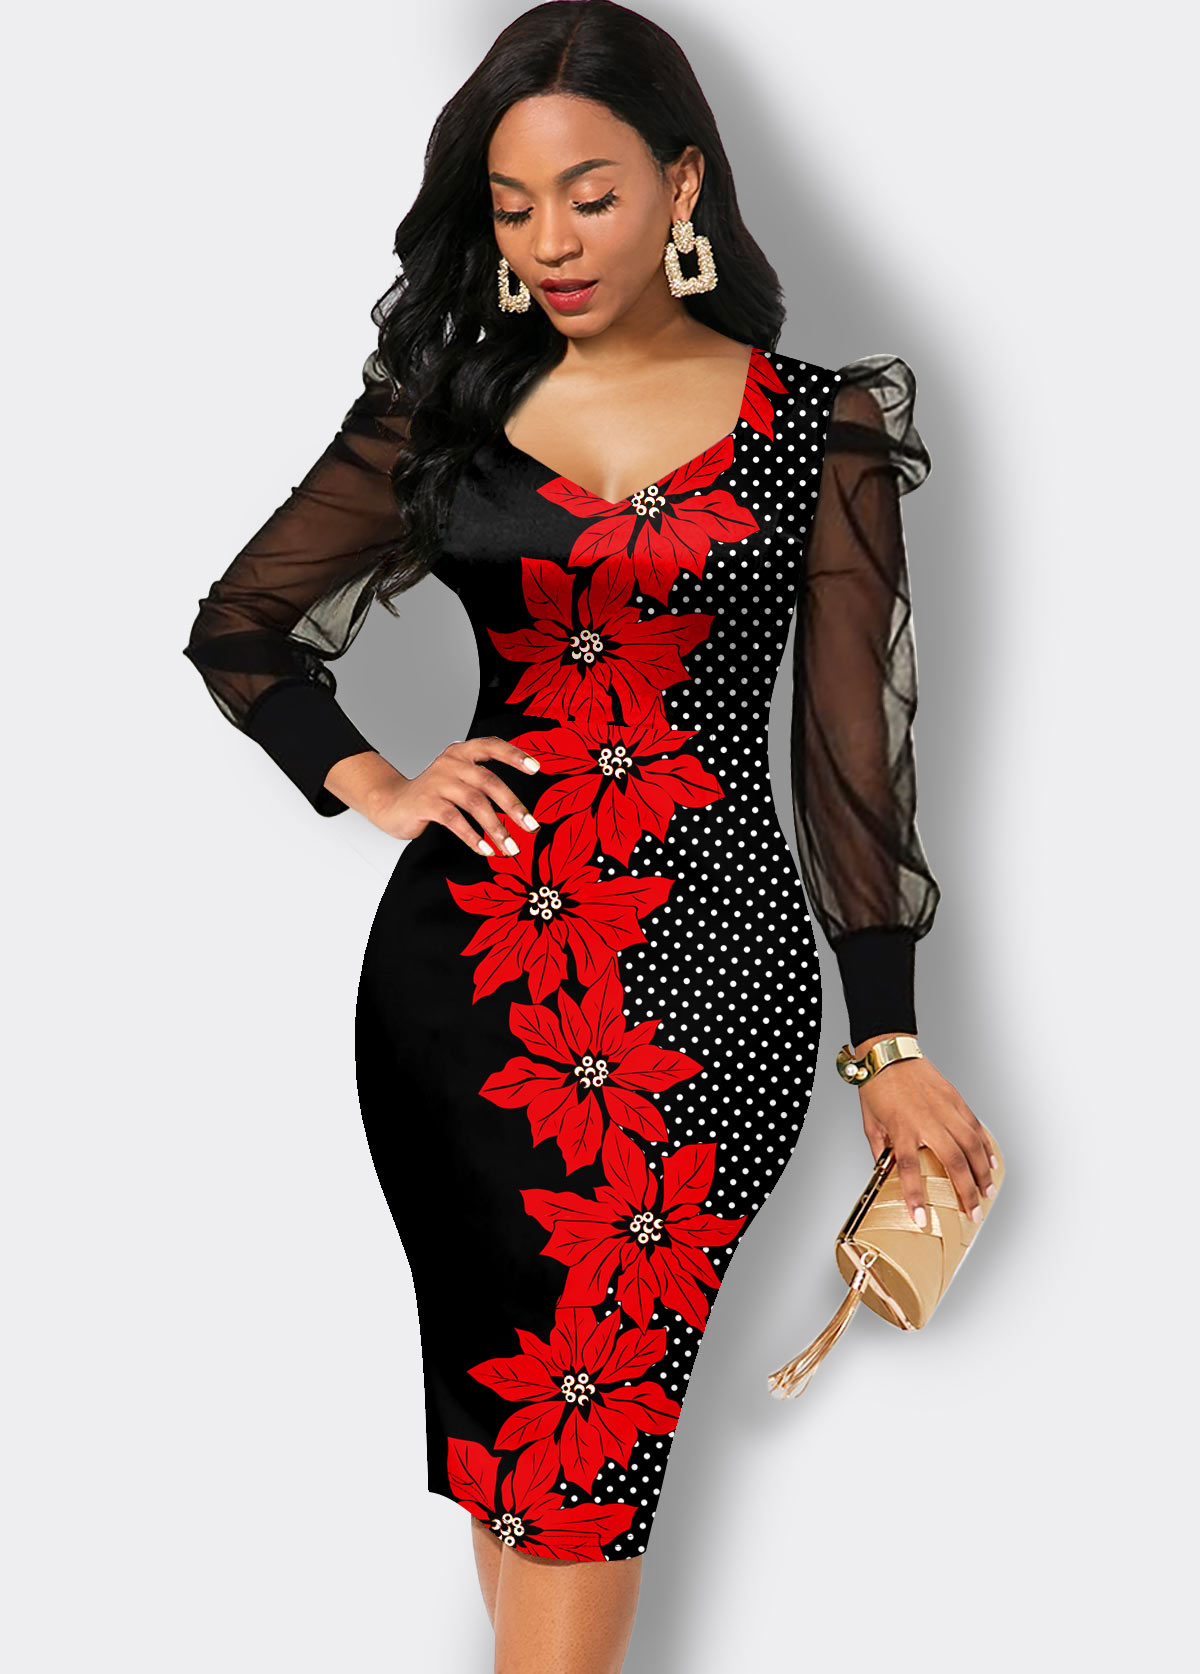 ROTITA Mesh Sleeve Floral Print Sheath Dress